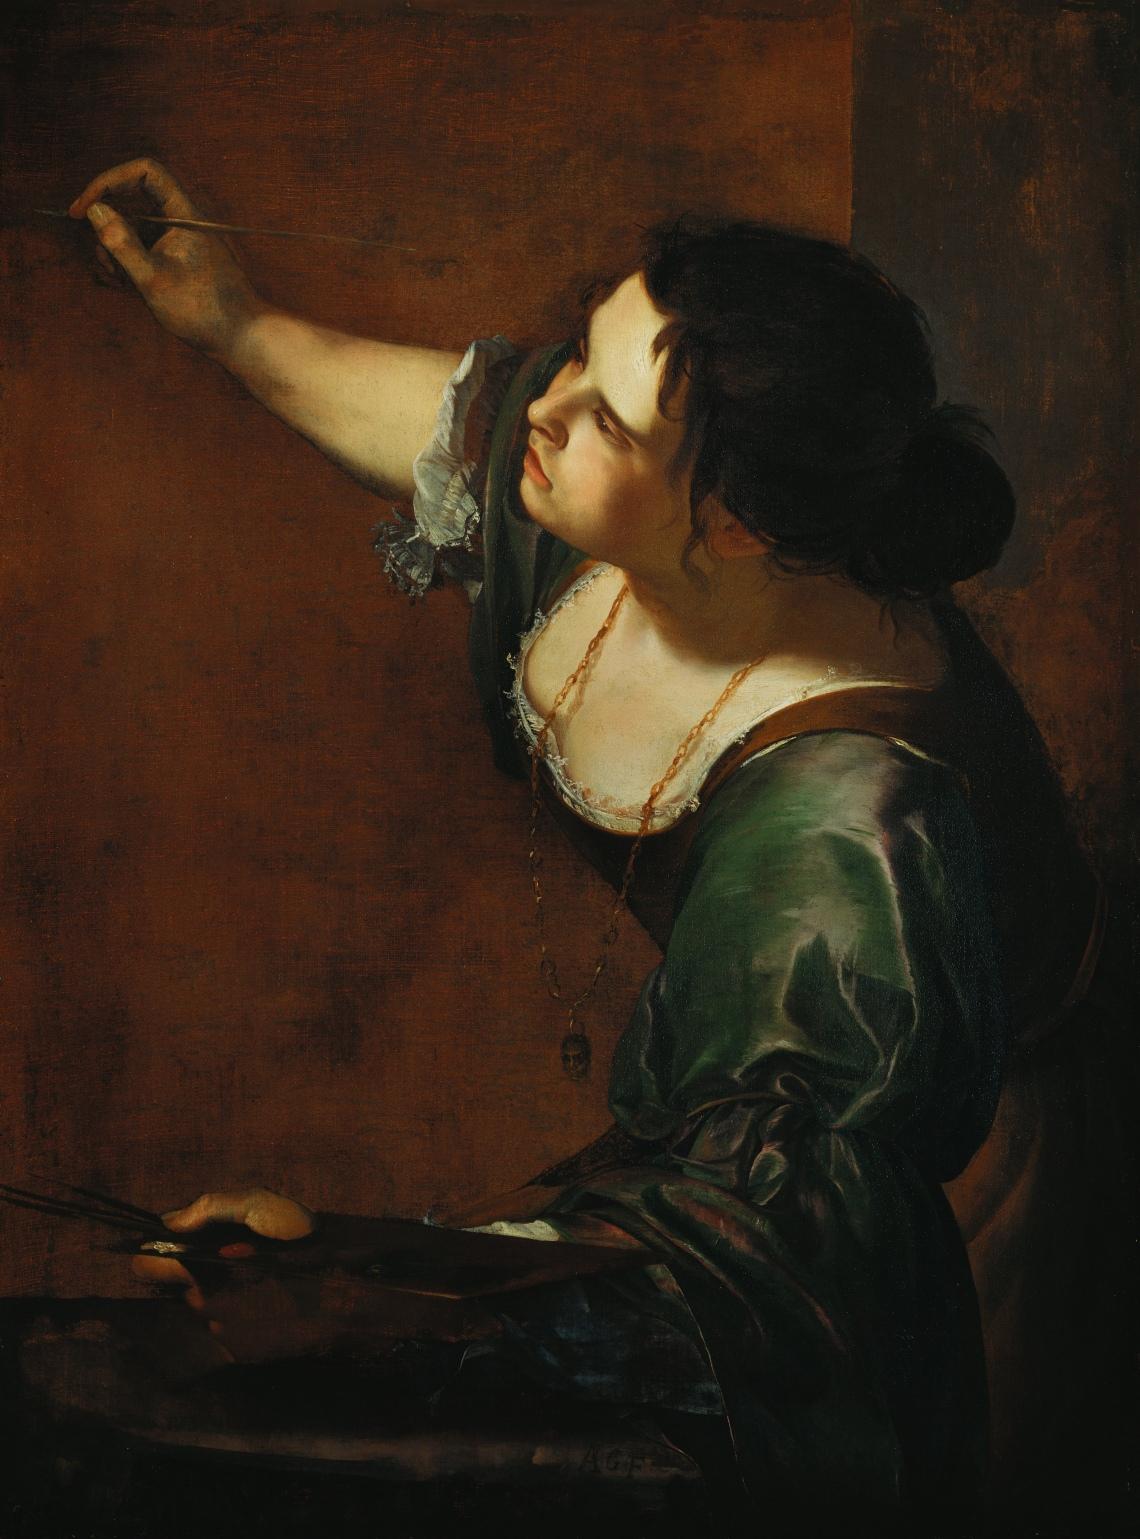 Self-portrait_as_the_Allegory_of_Painting_(La_Pittura)_-_Artemisia_Gentileschi